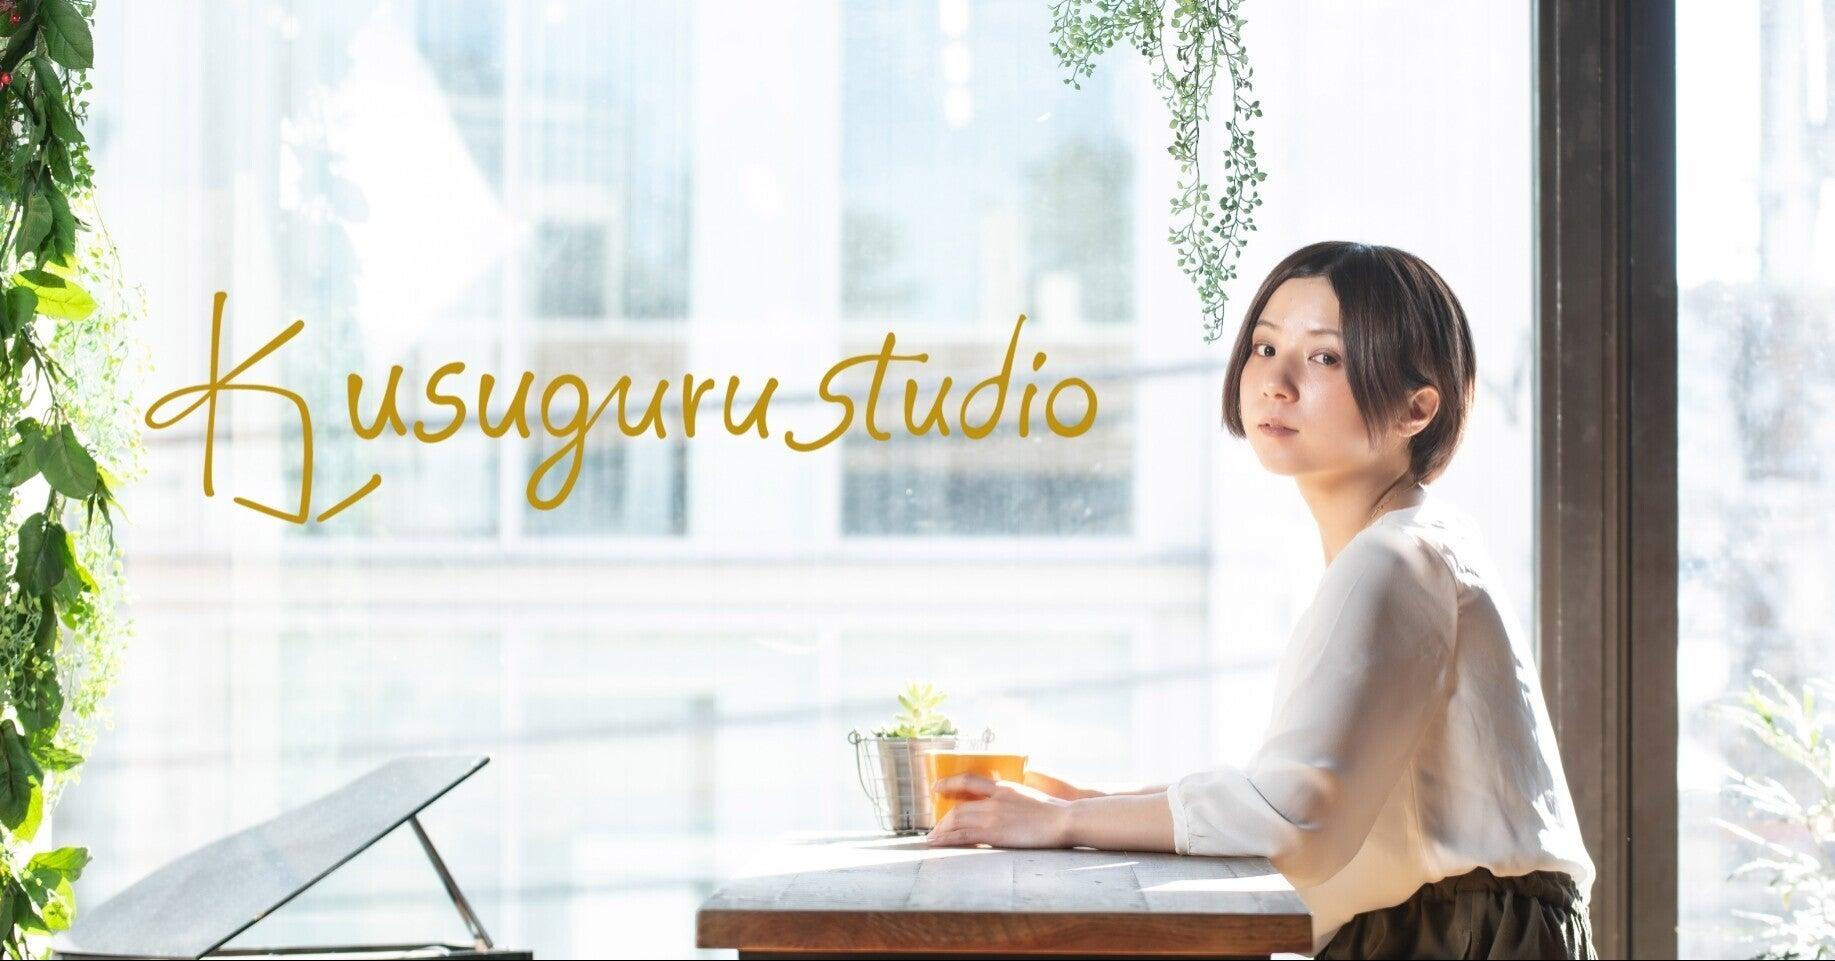 kusuguru studioオープンしました。